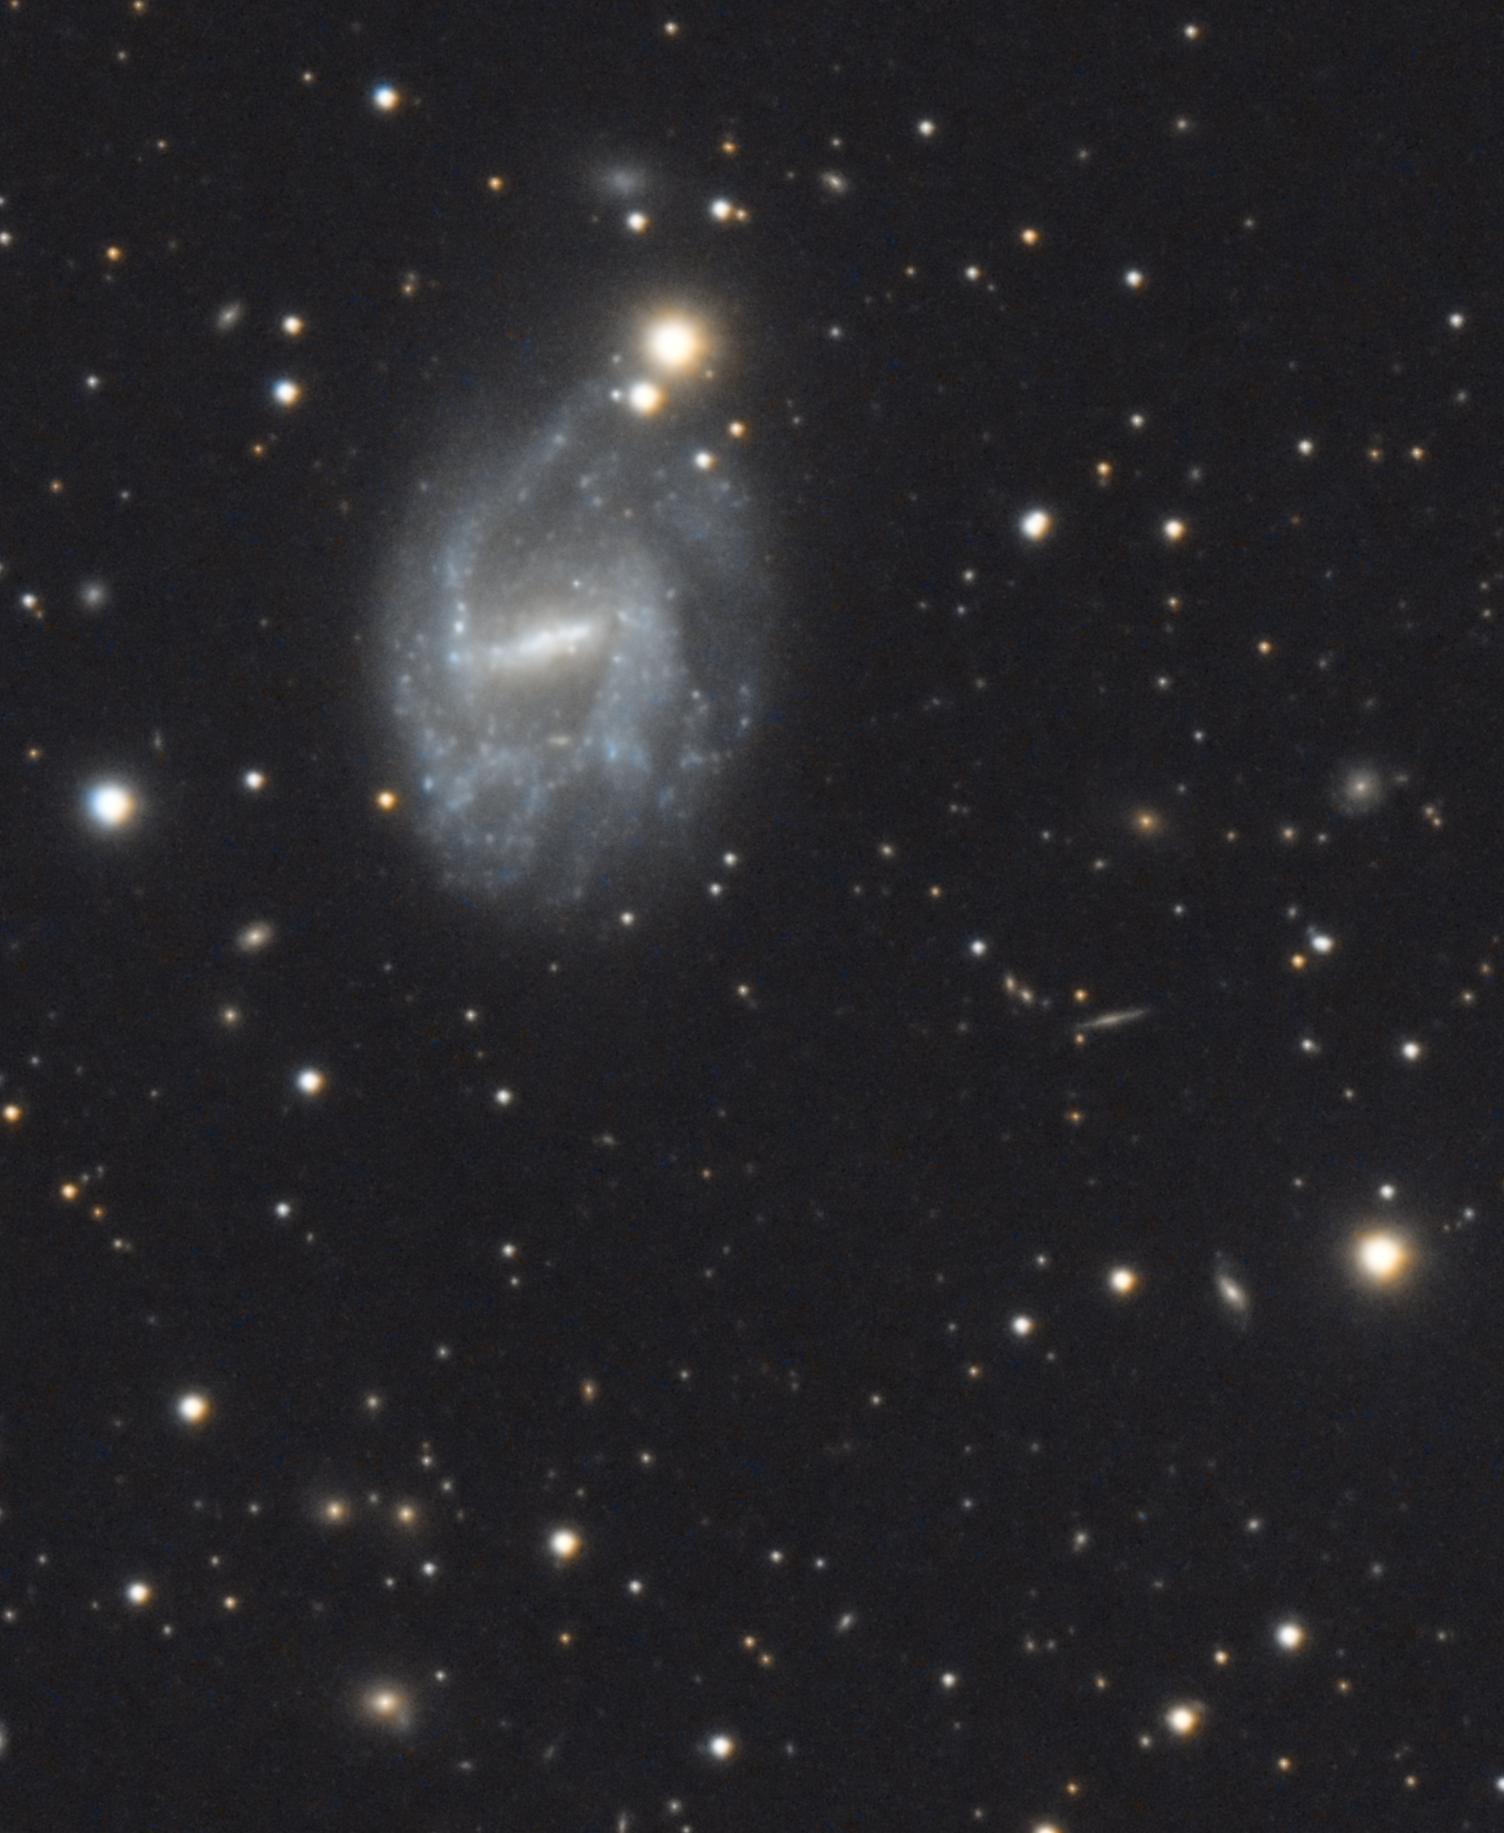 5c53ed6c87d39_NGC7741crop.png.f1f1aebdaf46350f039aafb3385c2a91.png